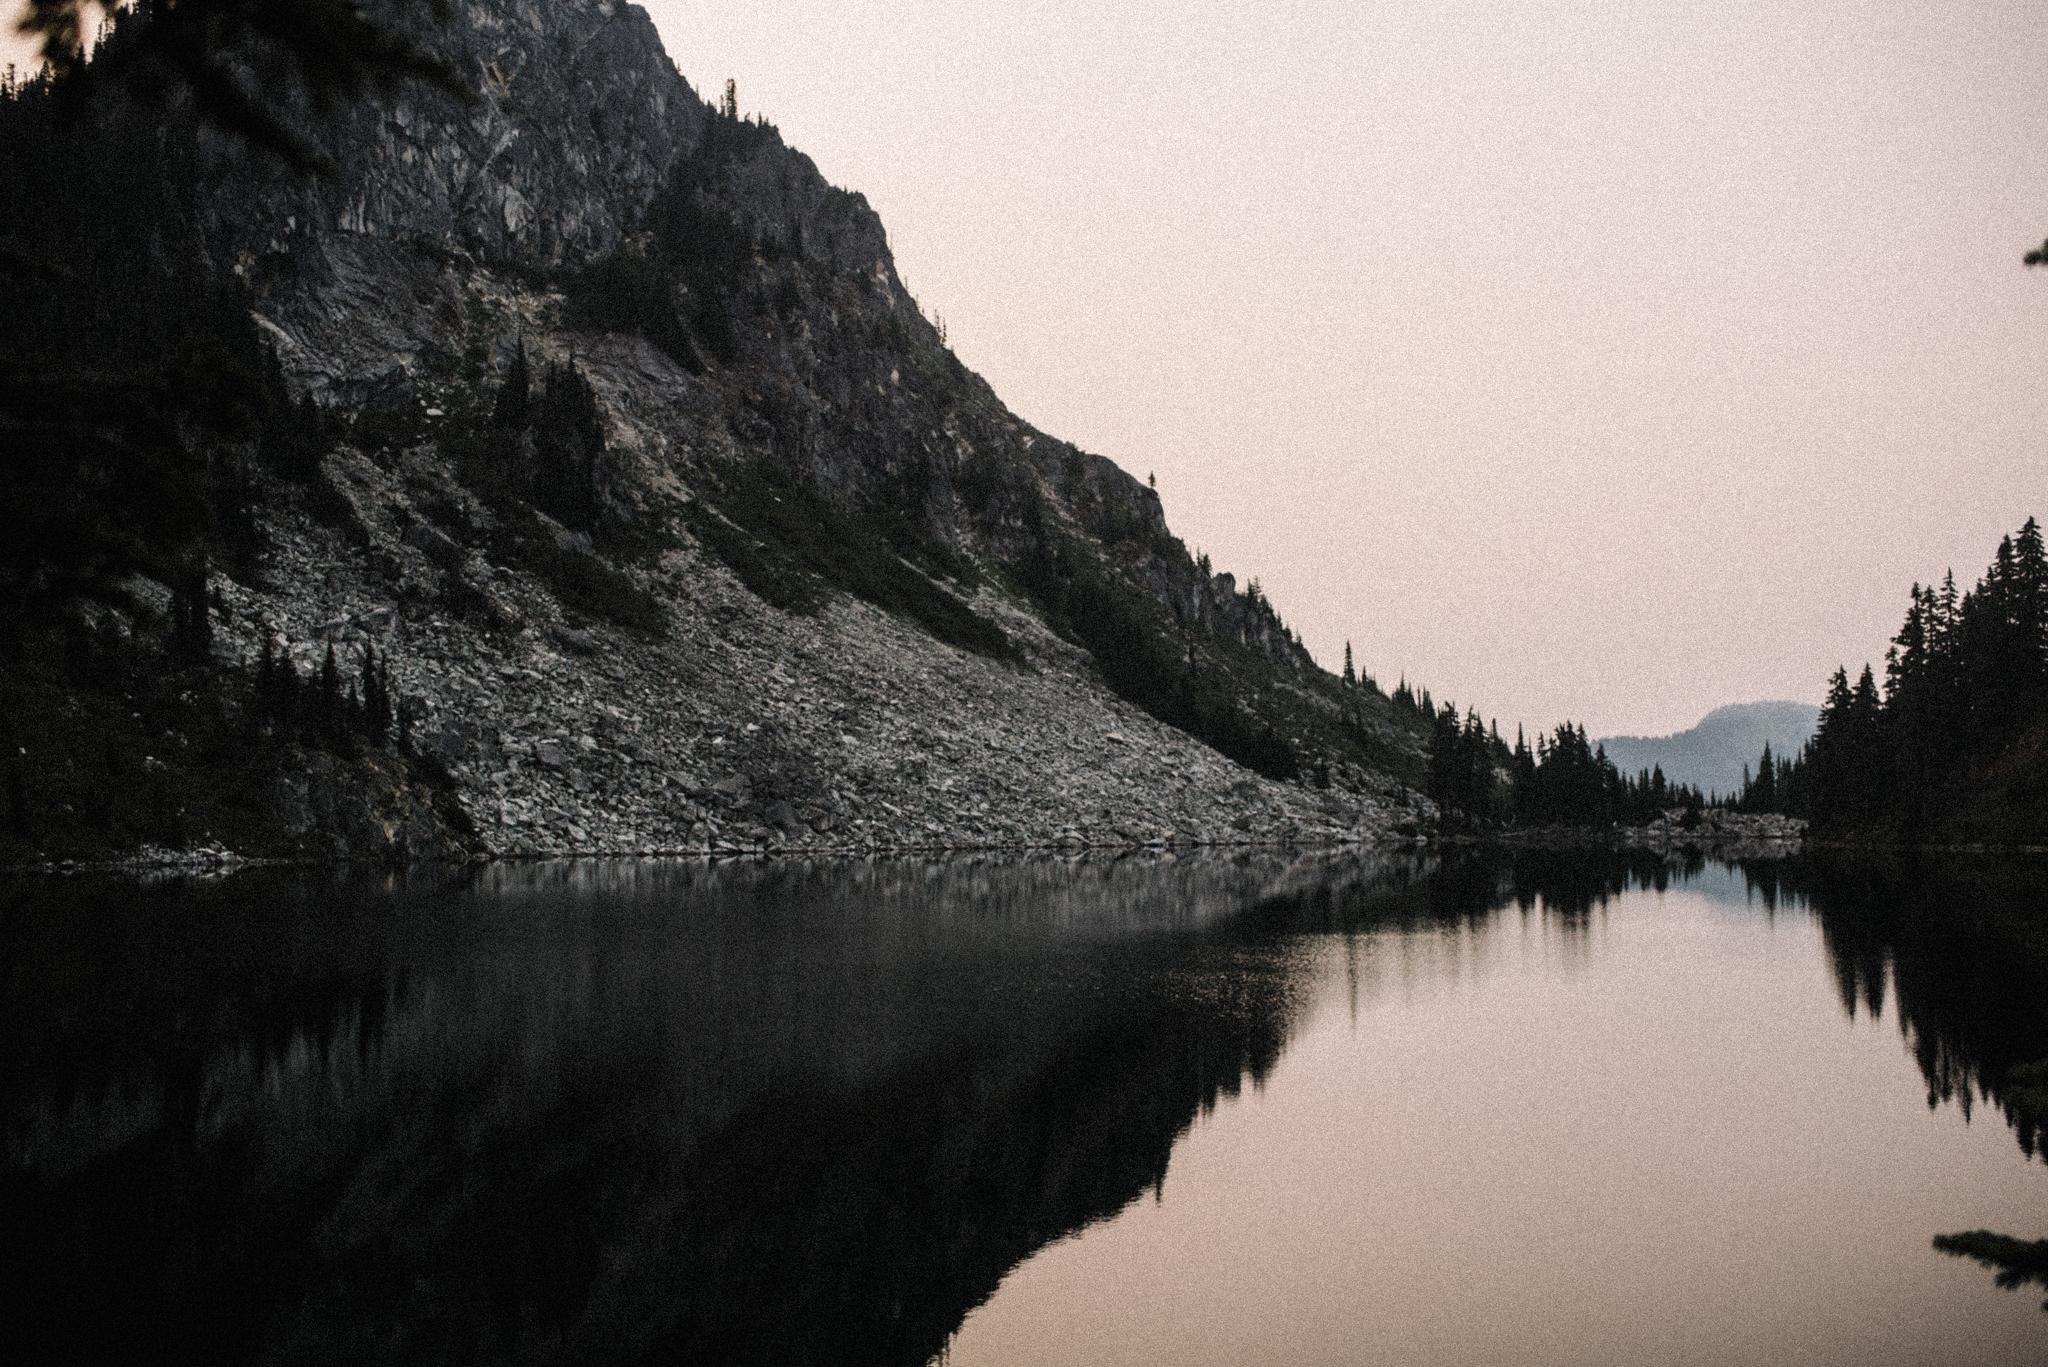 Megan and Andrew Lake Valhalla Washington PNW Adventure Elopement White Sails Creative Sunrise Hike_44.JPG